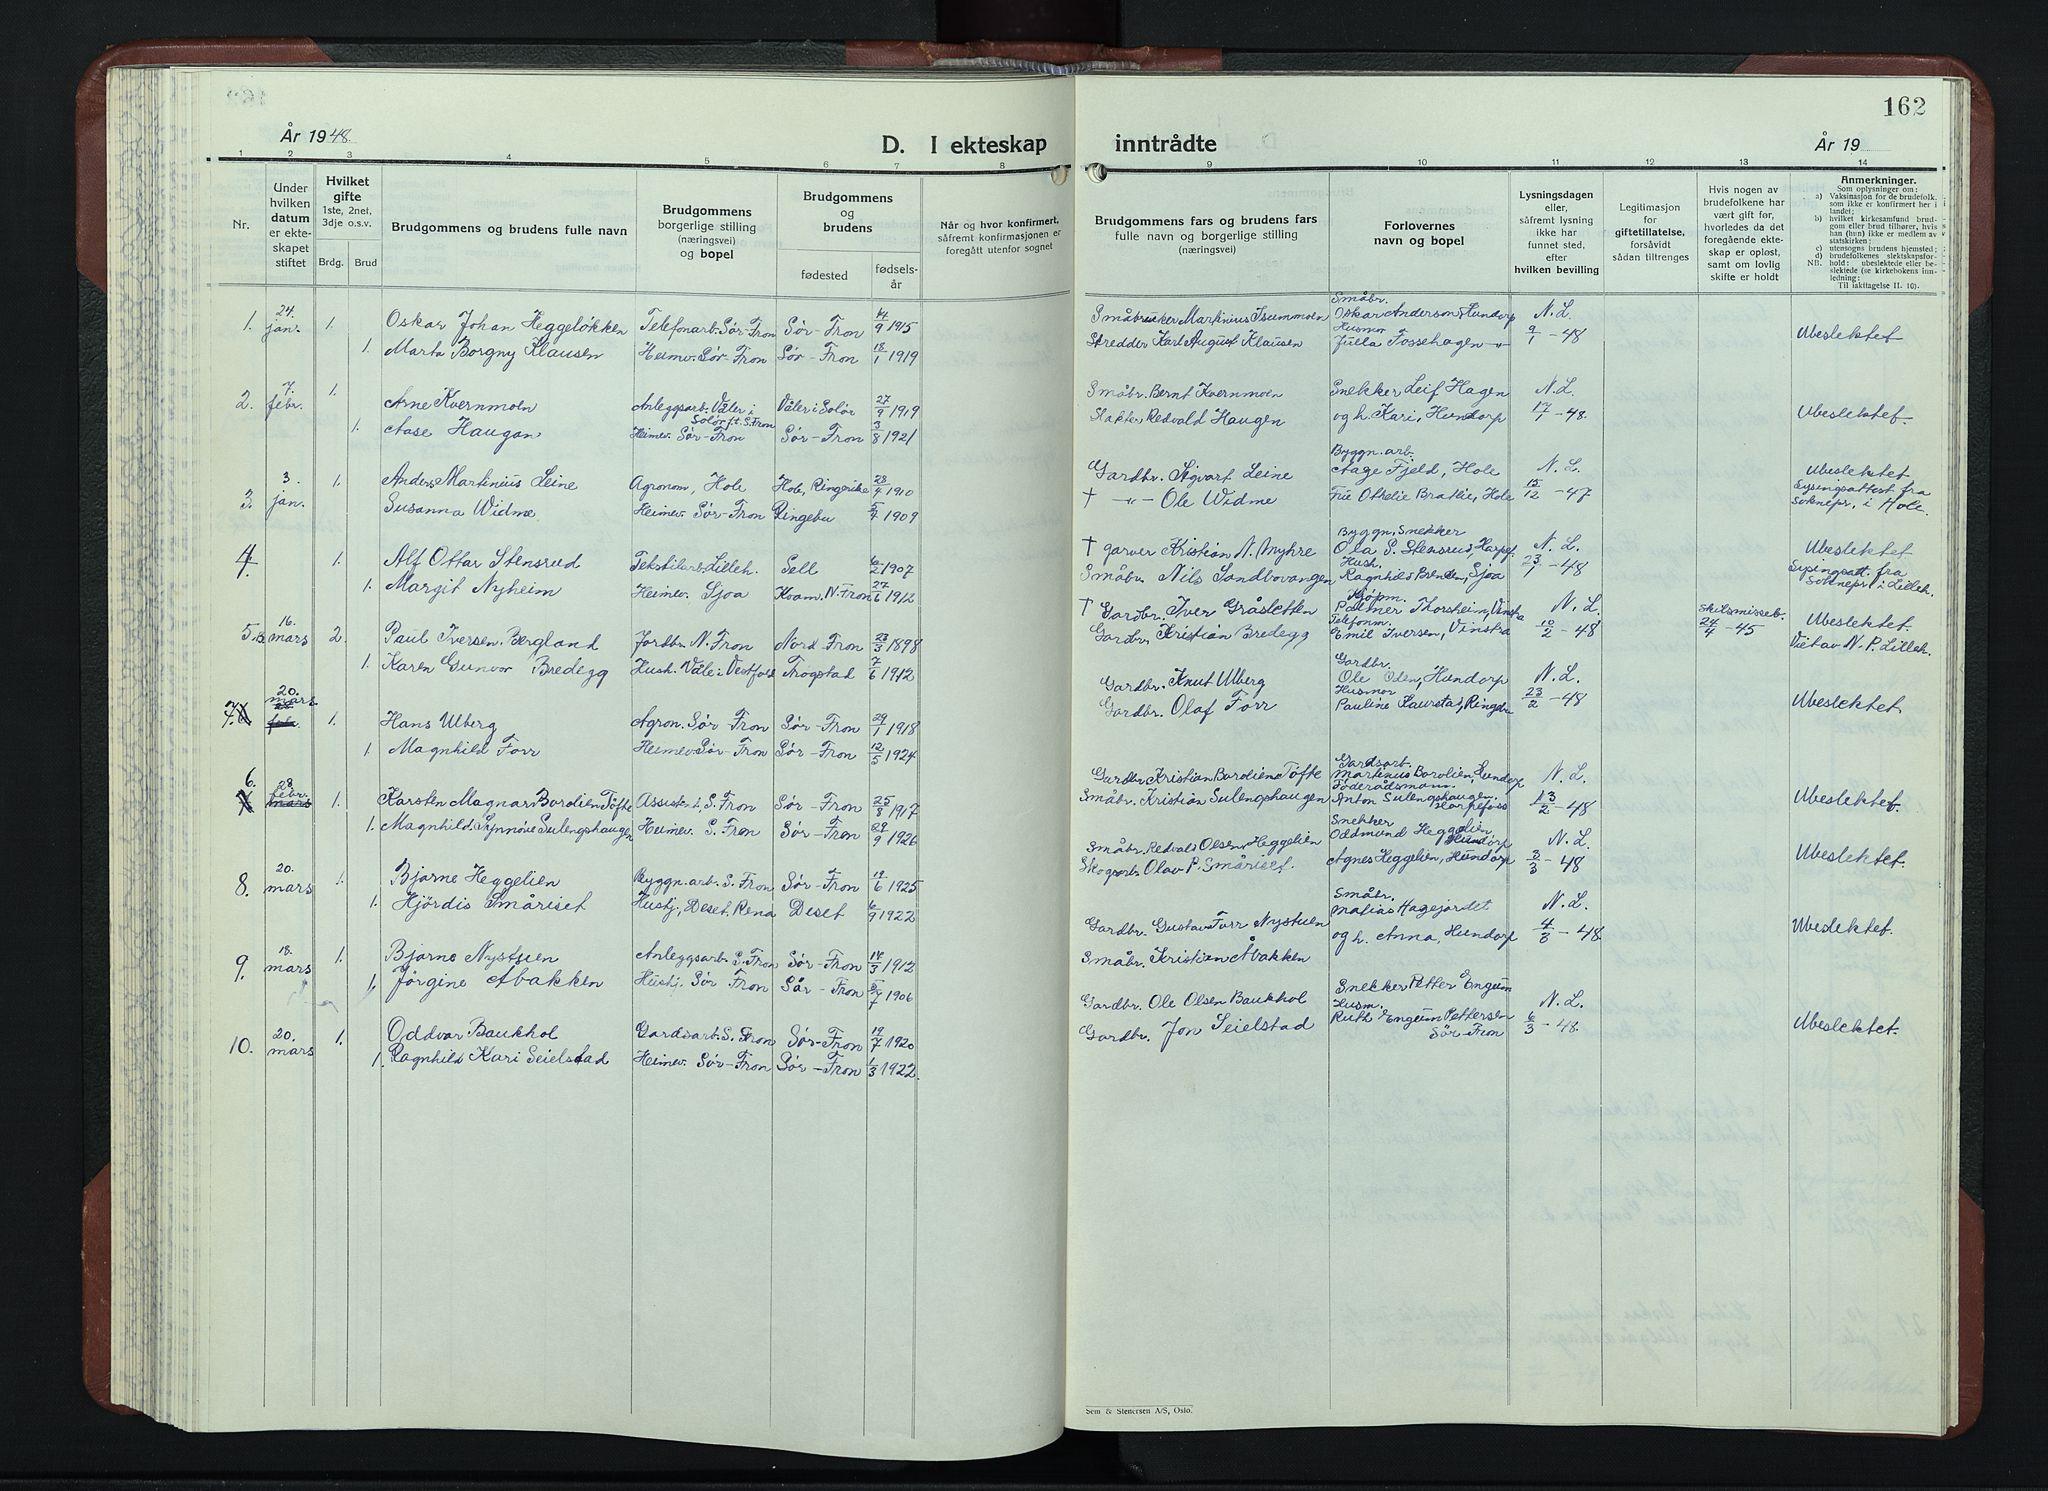 SAH, Sør-Fron prestekontor, H/Ha/Hab/L0006: Klokkerbok nr. 6, 1933-1948, s. 162